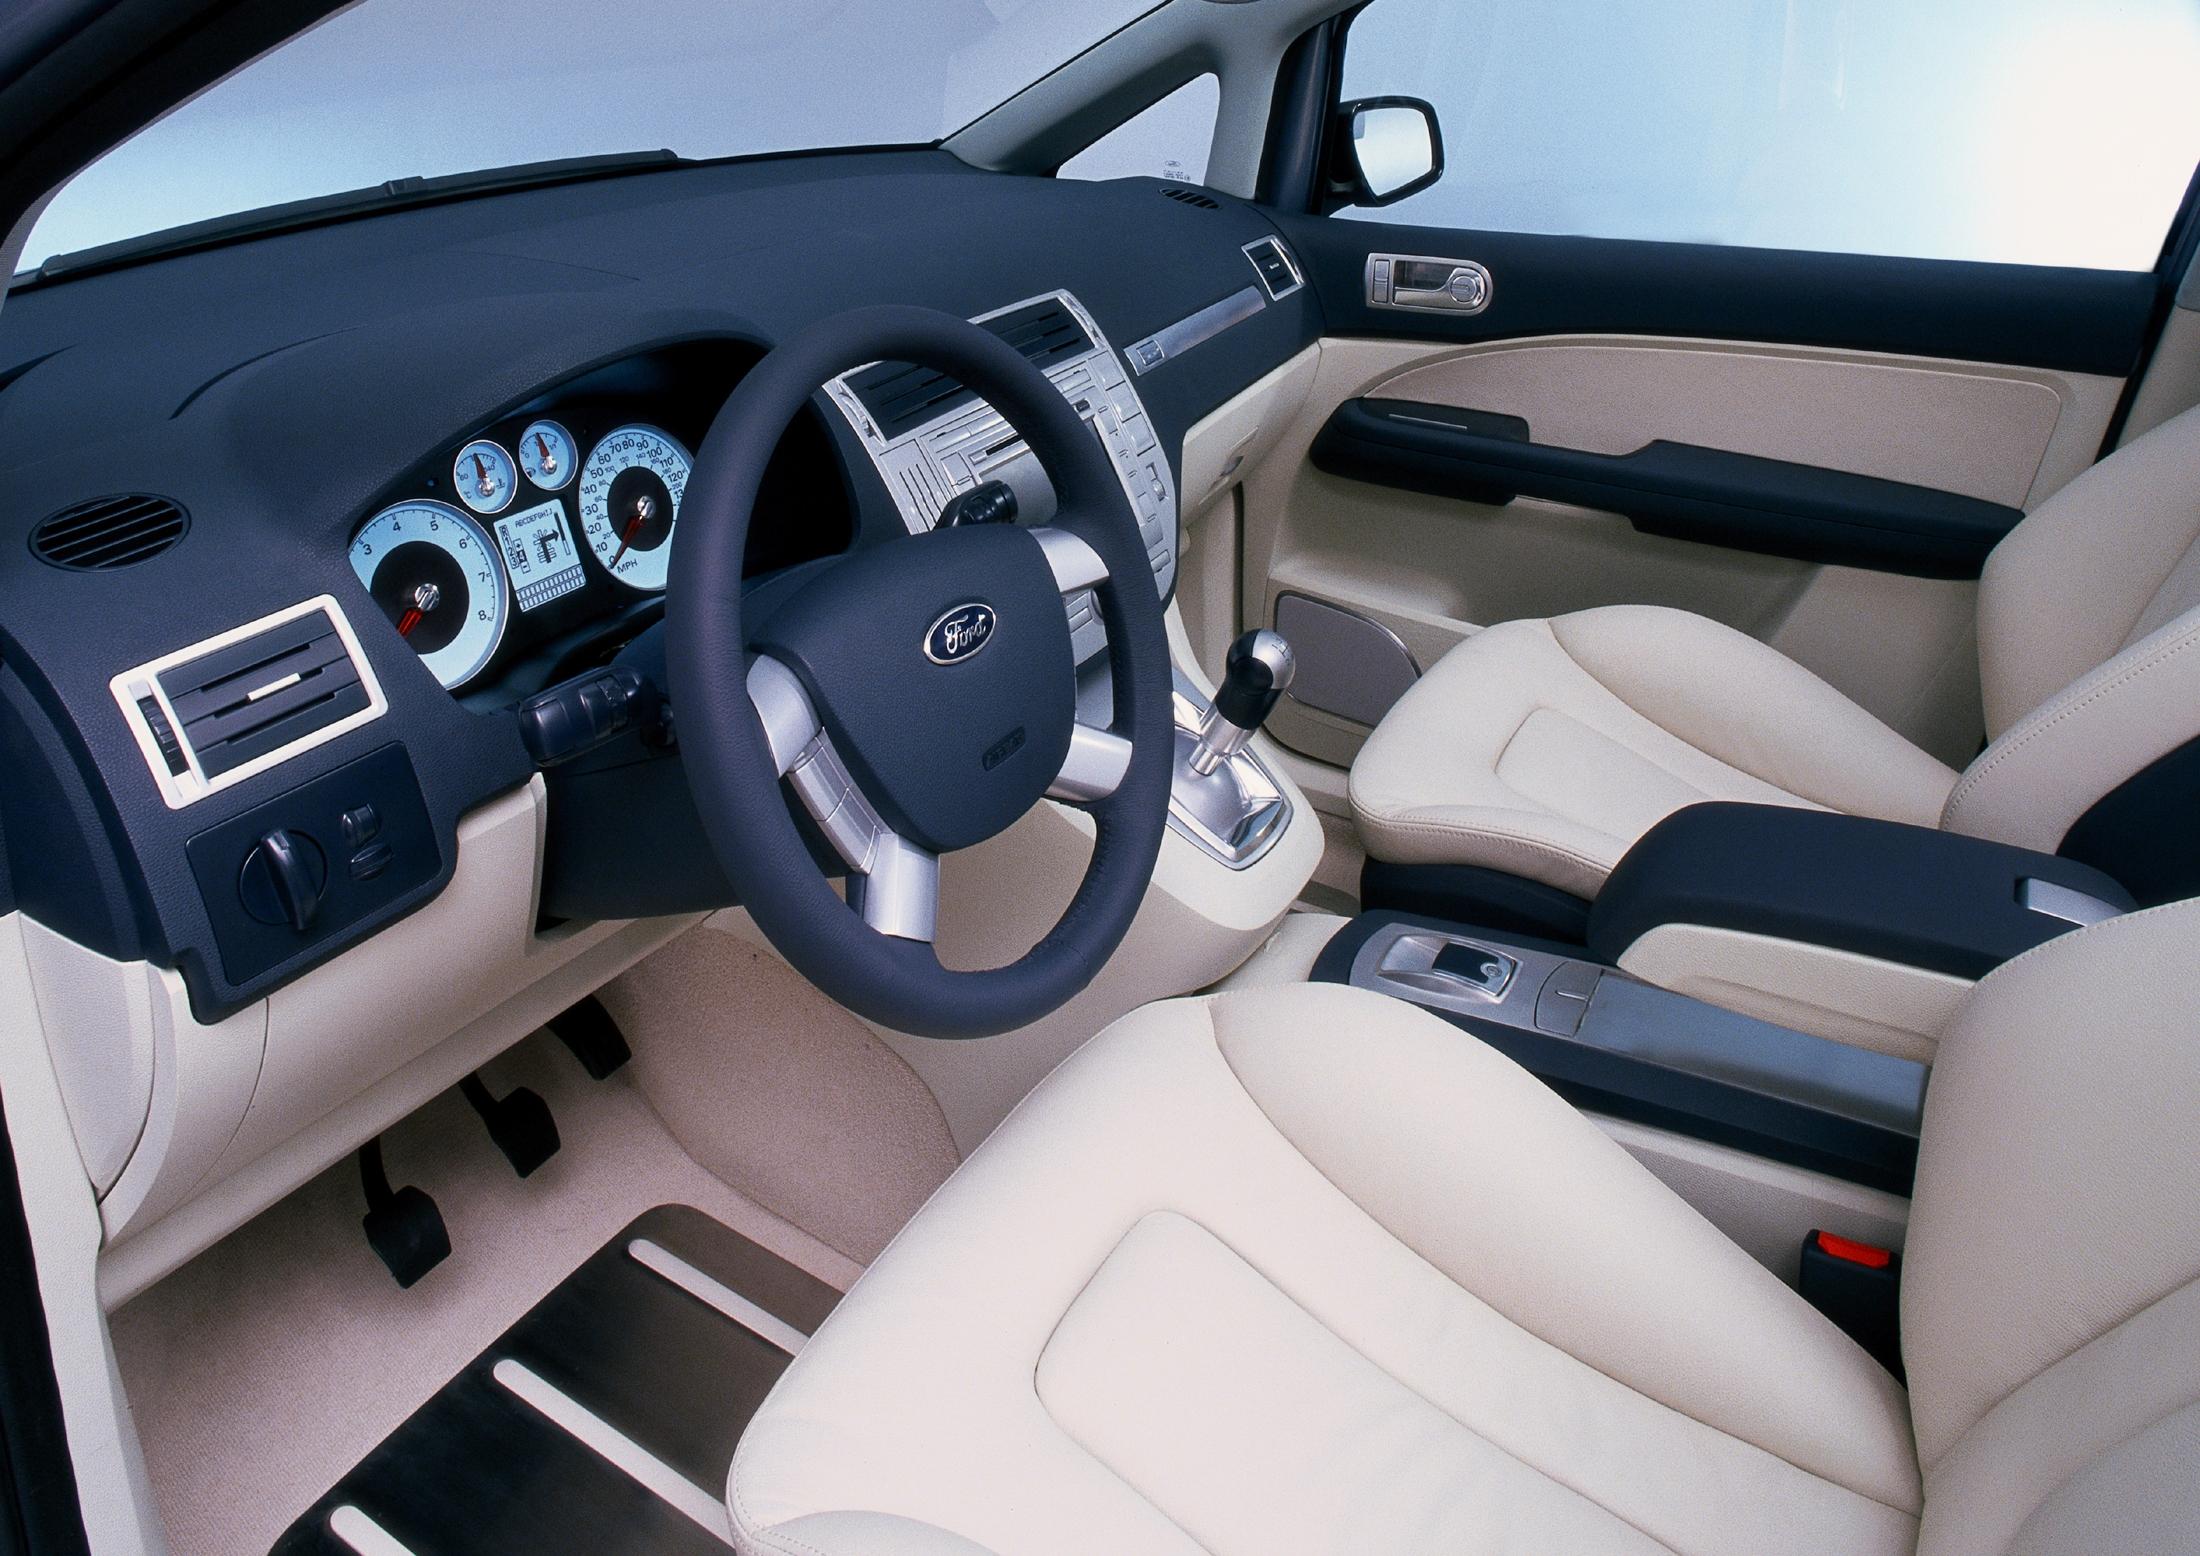 Ford C-max 2003 foto - 2